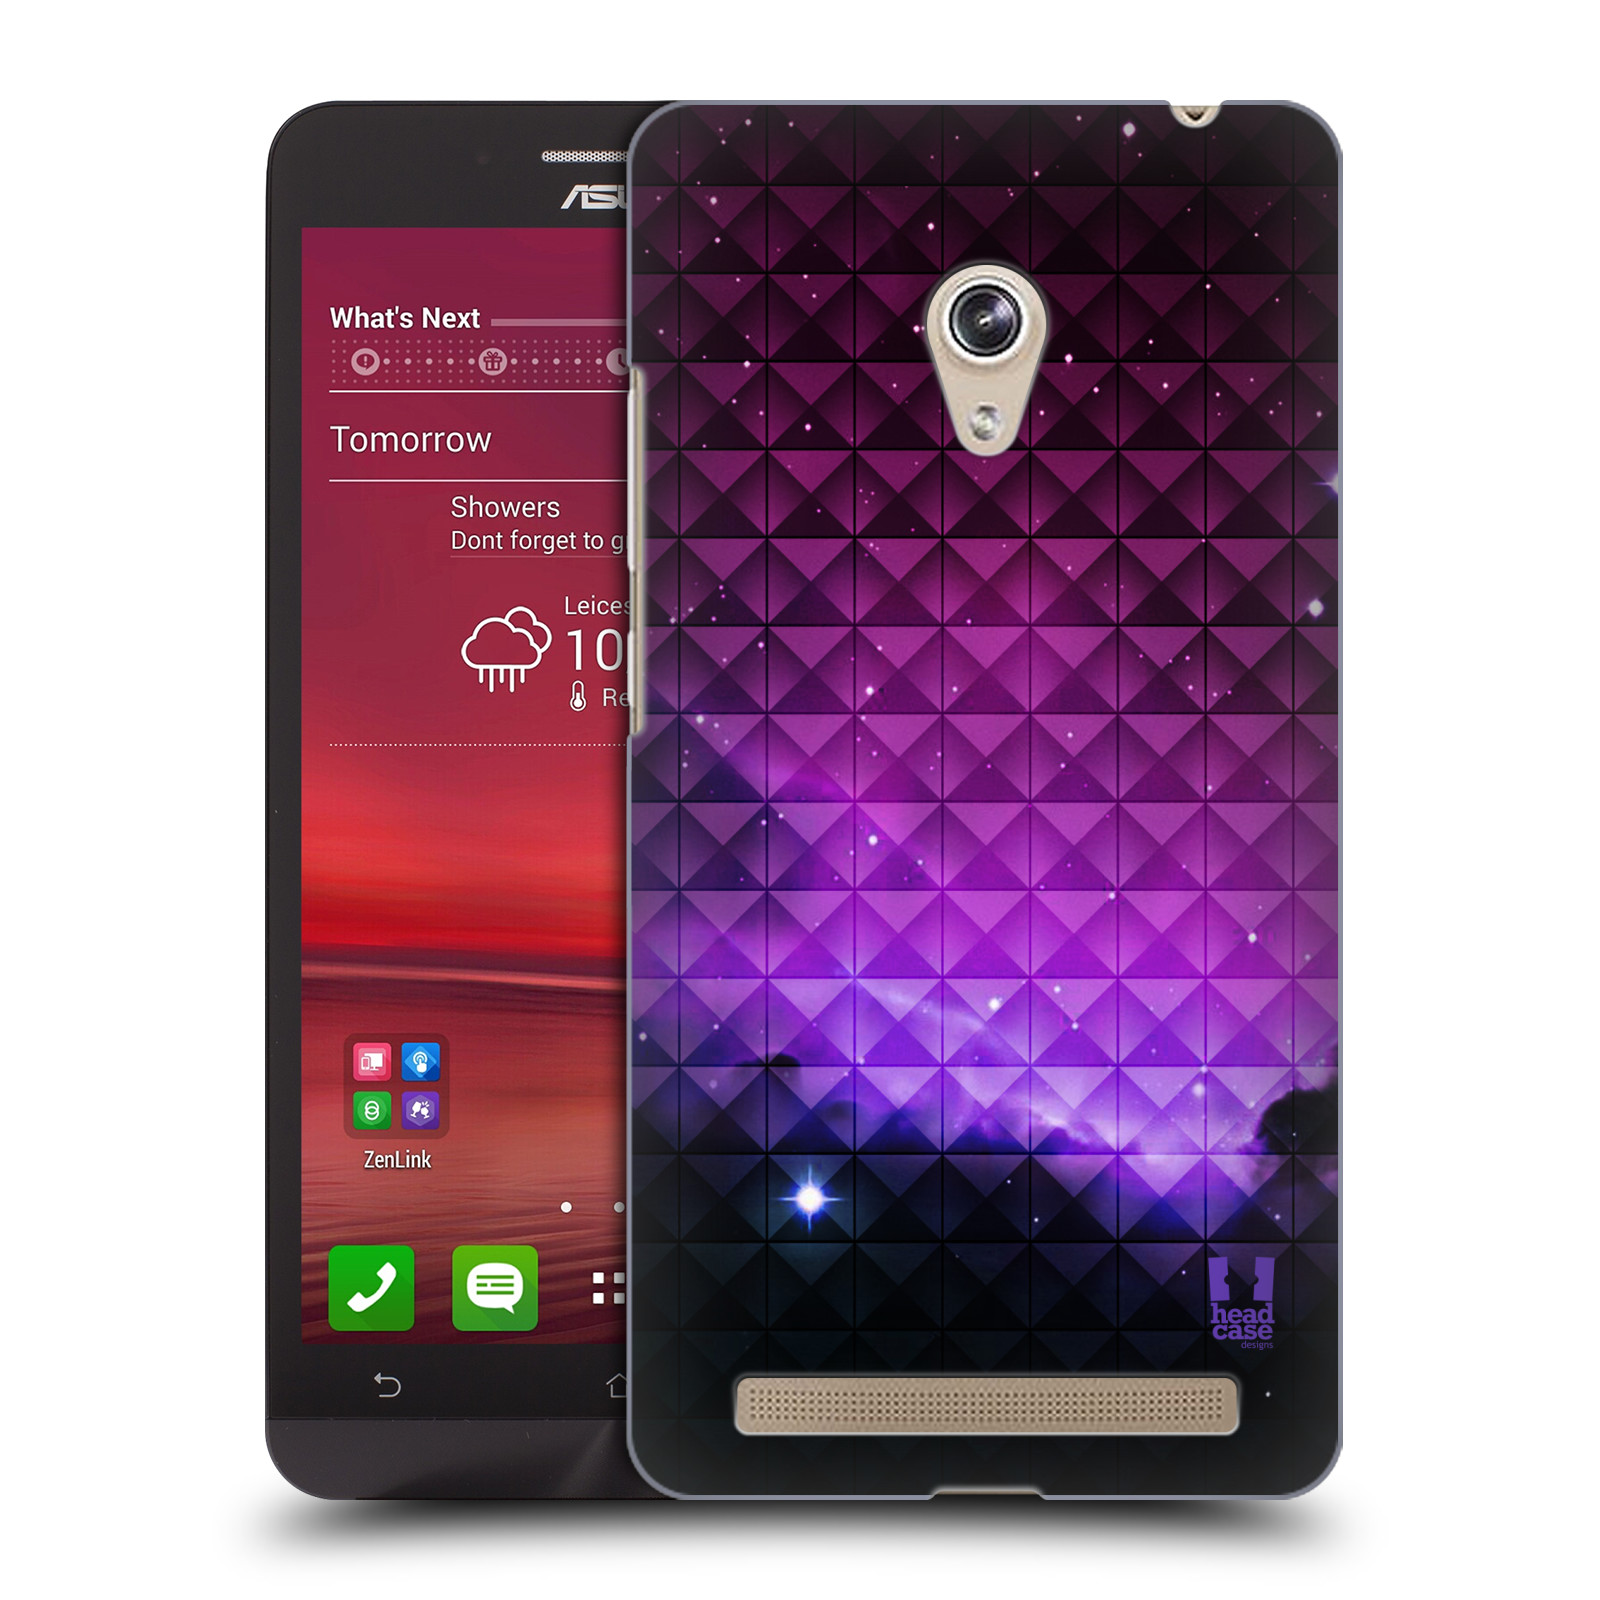 Plastové pouzdro na mobil Asus Zenfone 6 HEAD CASE PURPLE HAZE (Kryt či obal na mobilní telefon Asus Zenfone 6 A600CG / A601CG)